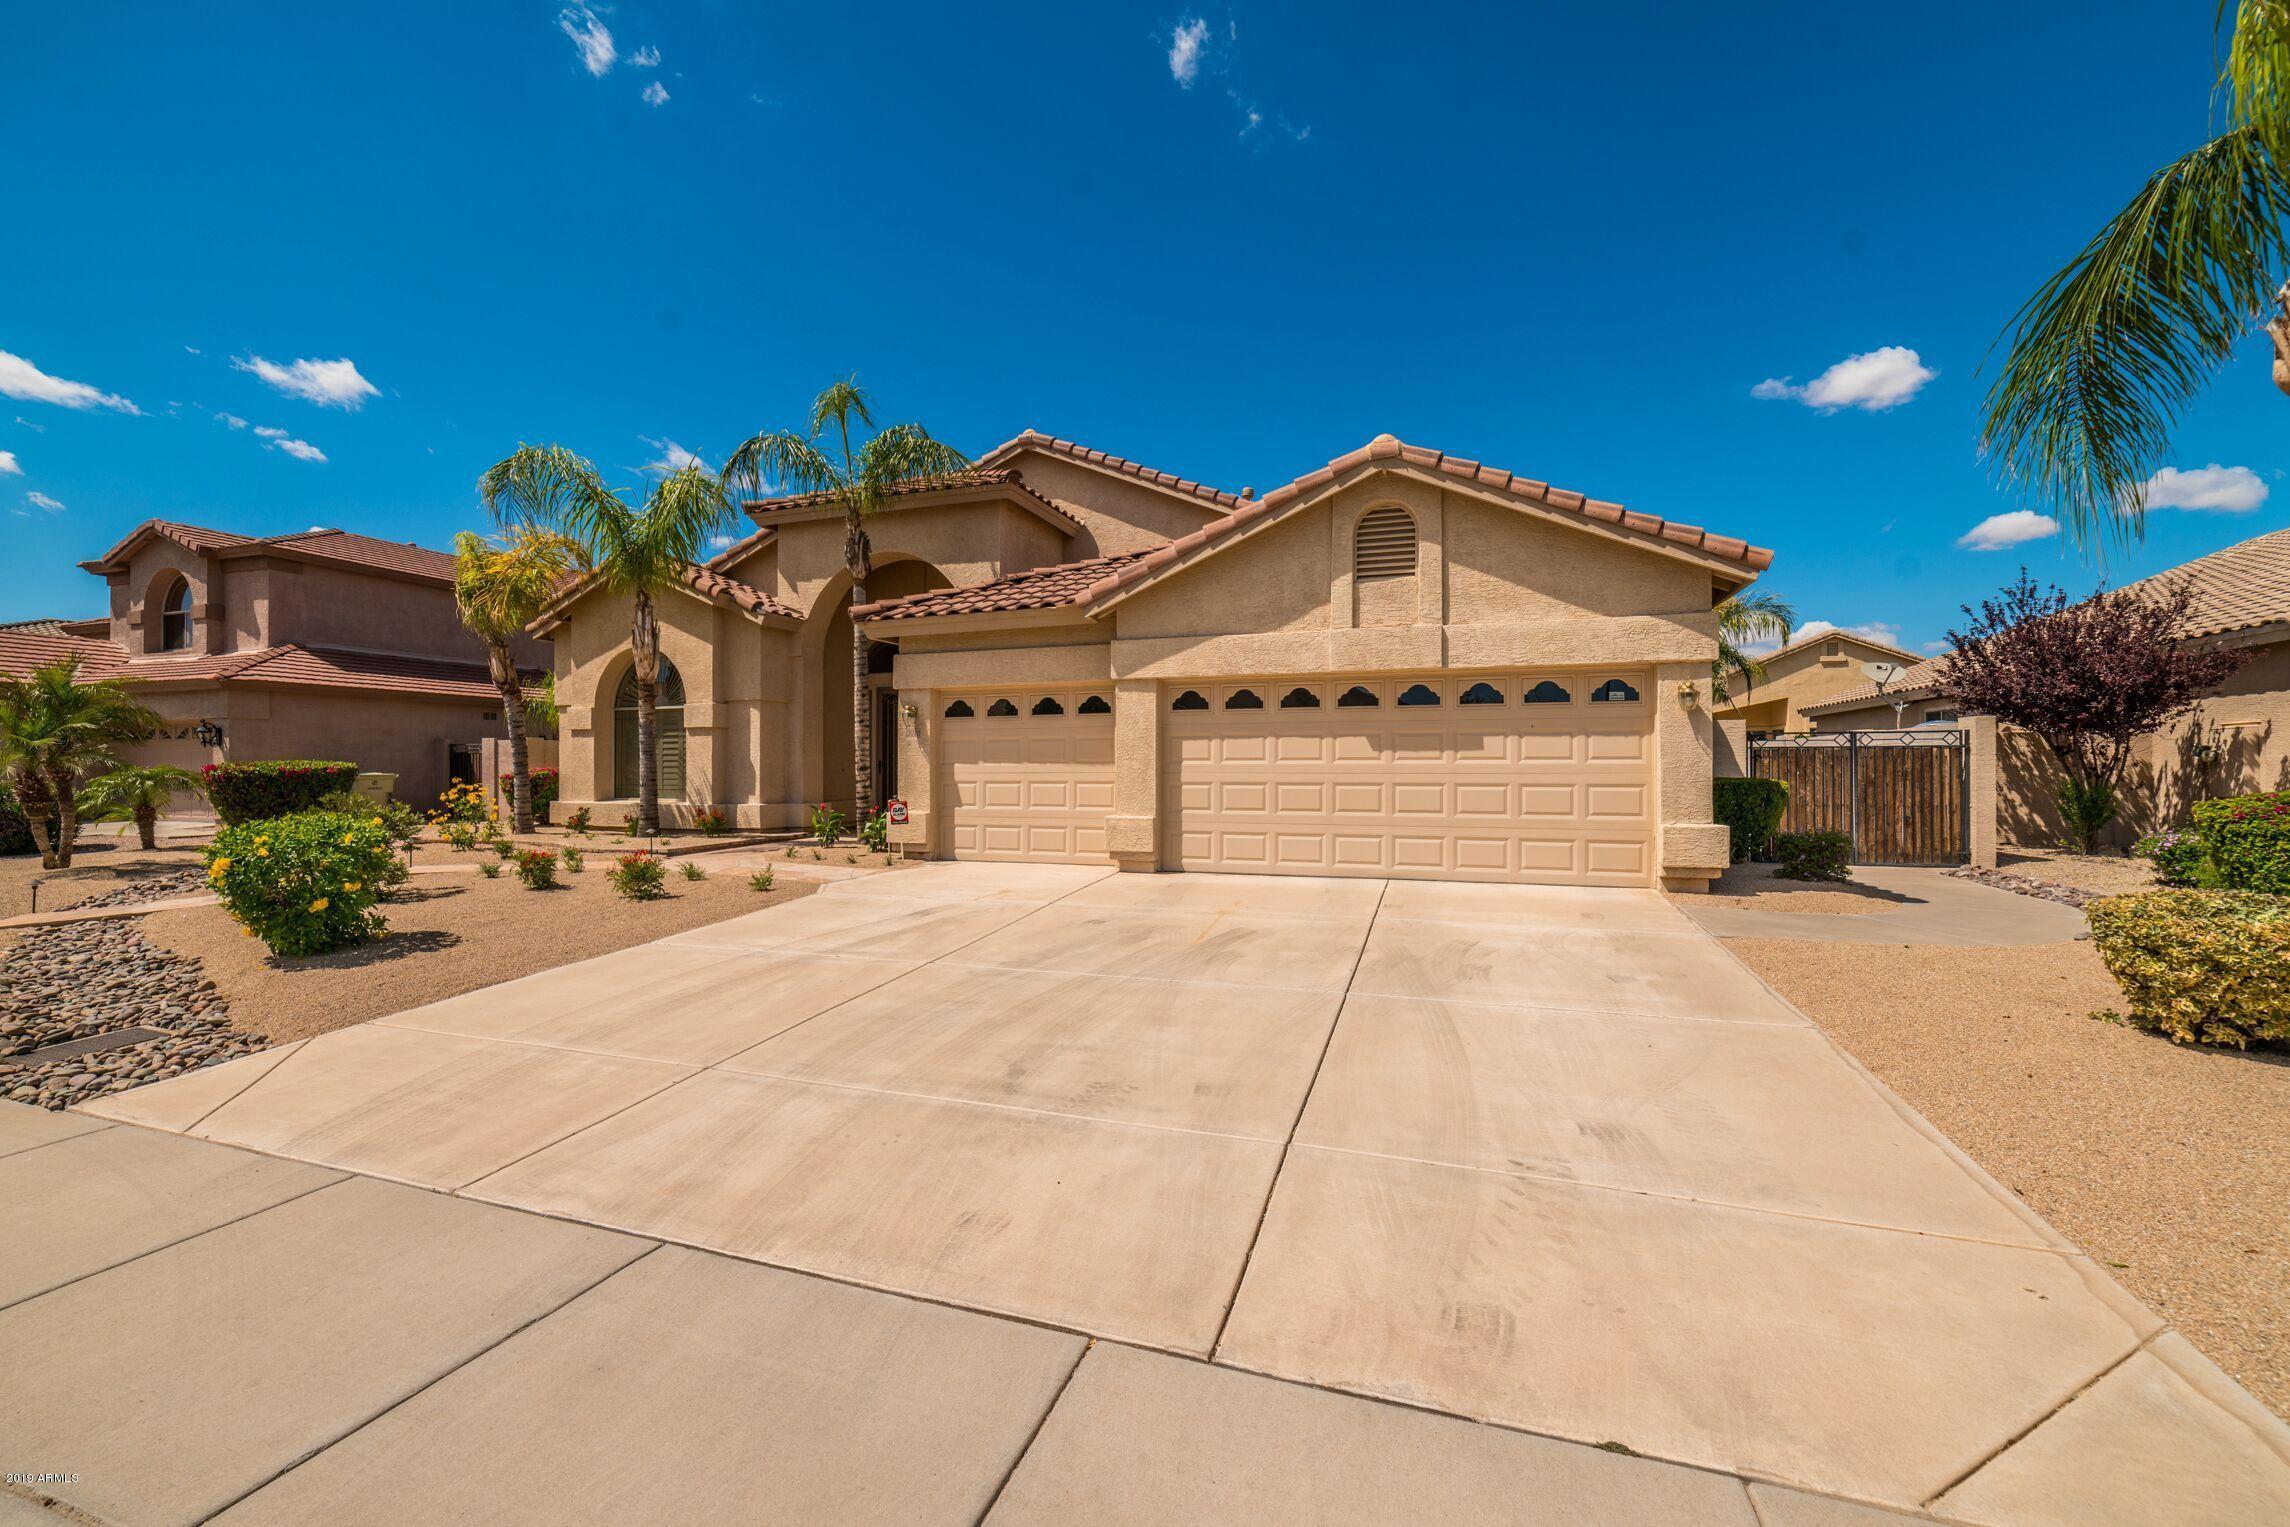 Photo of 7010 W QUAIL Avenue, Glendale, AZ 85308